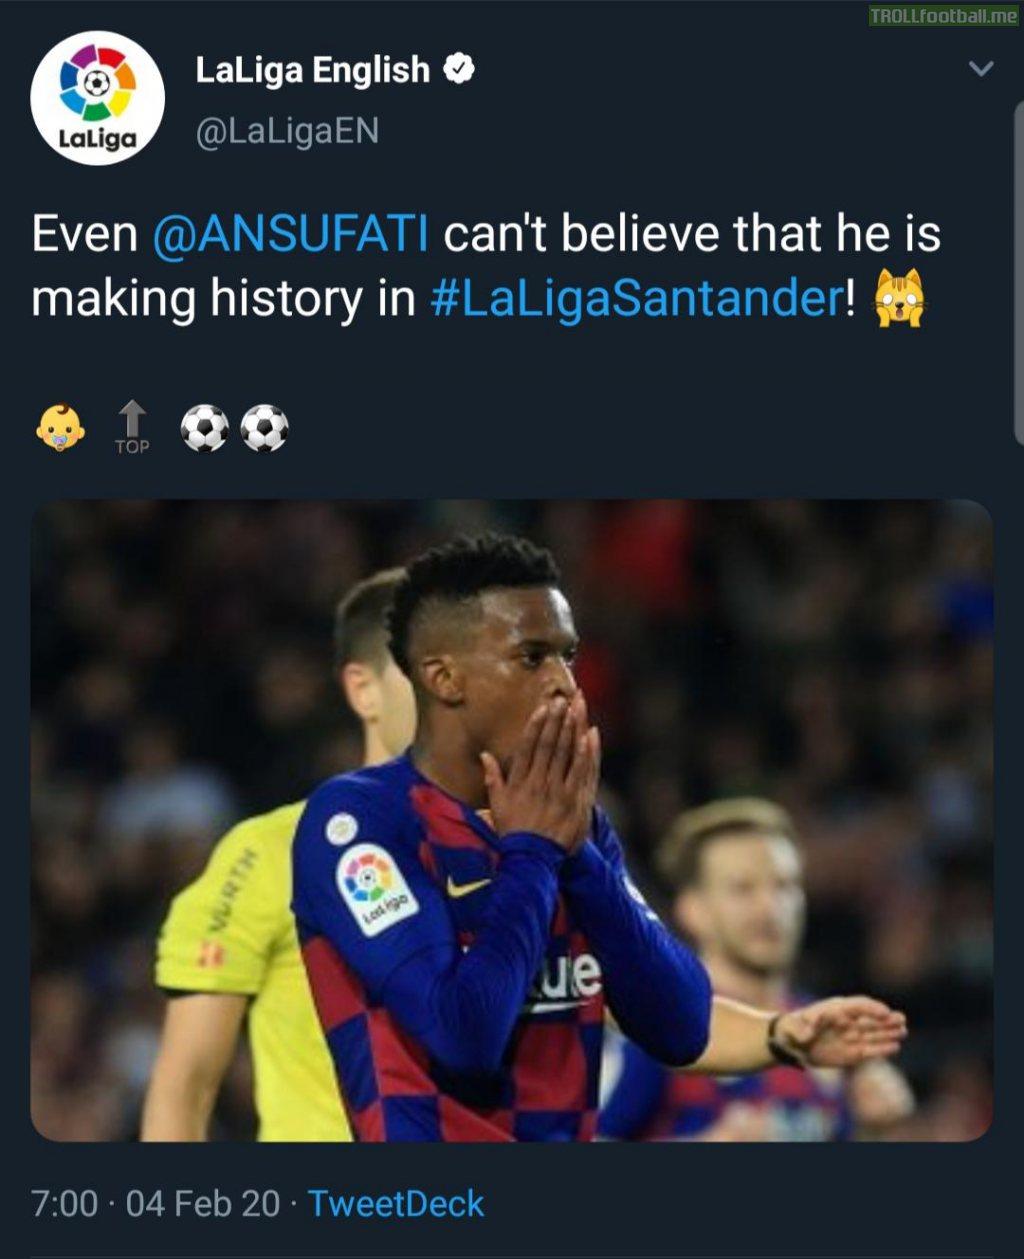 La Liga's official Twitter account mistaking Semedo for Fati